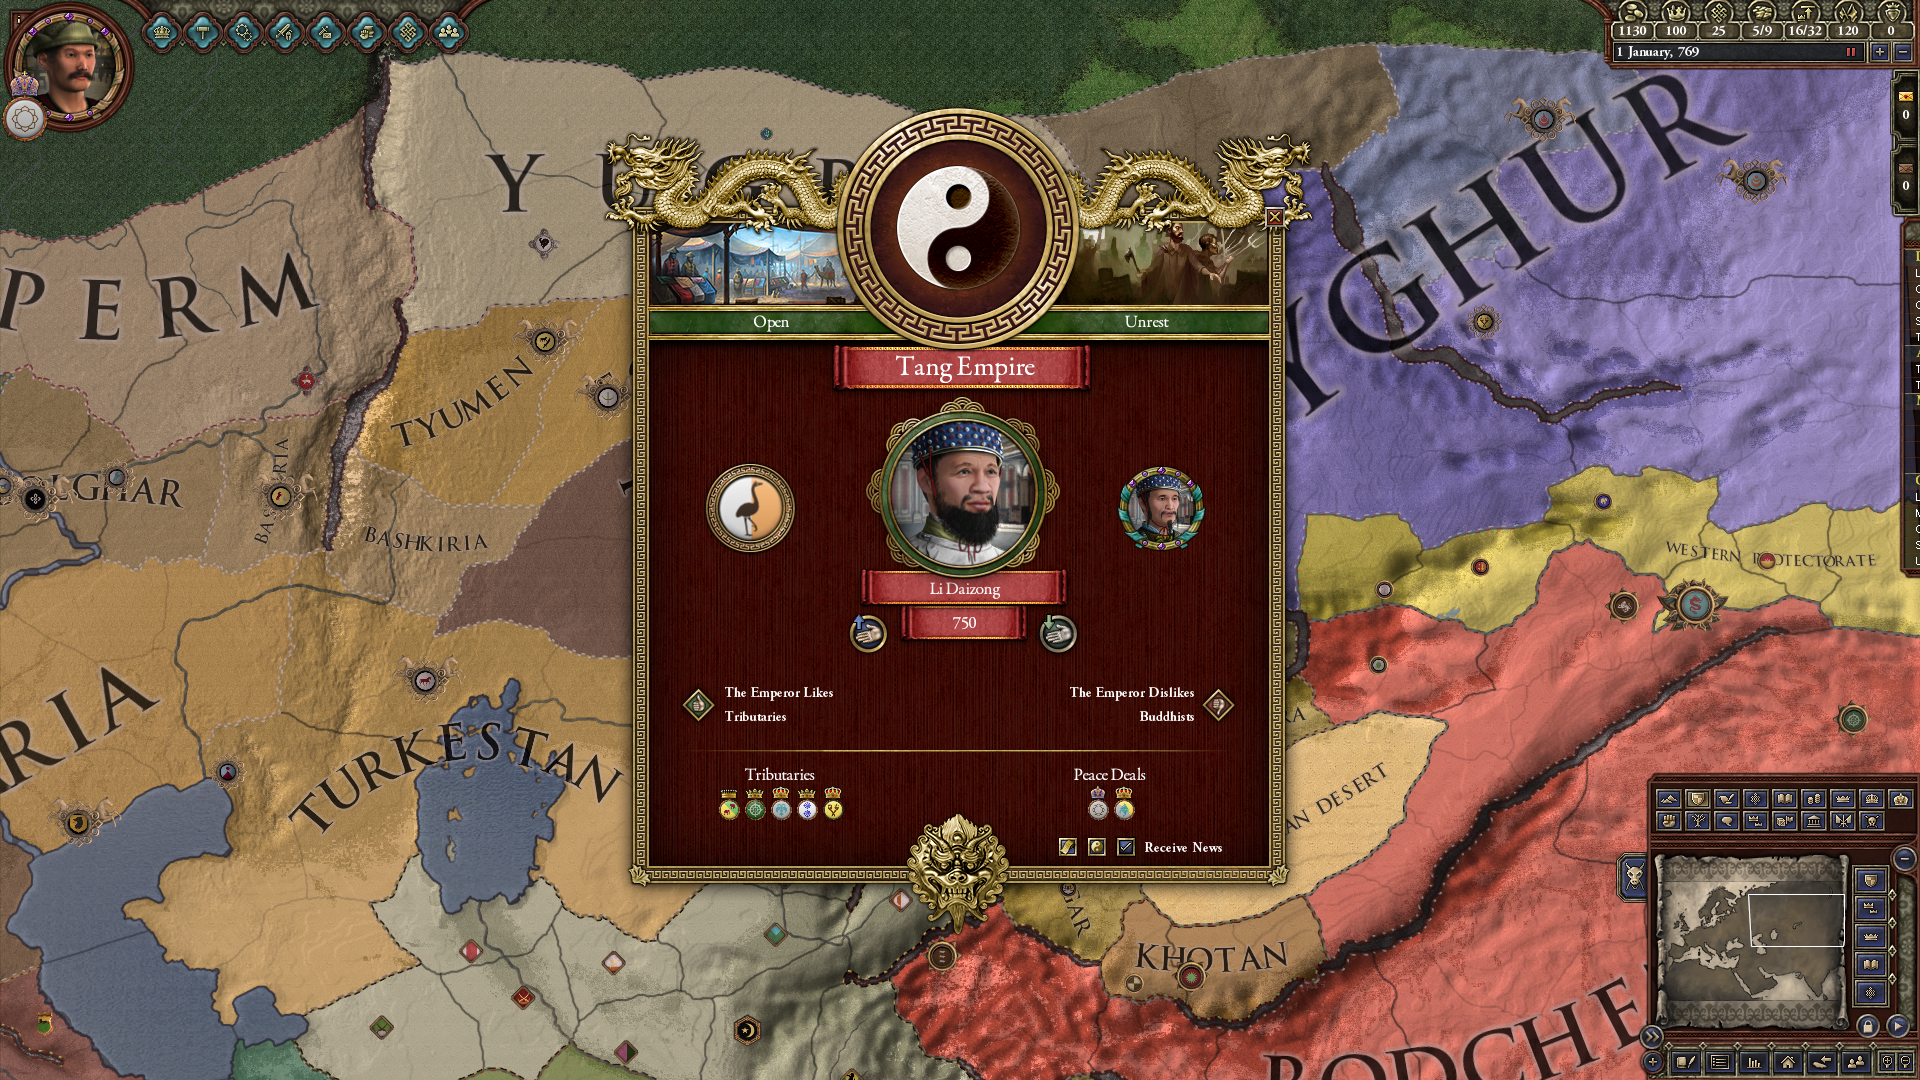 Analysis of Dragon Throne Screenshot | Paradox Interactive Forums